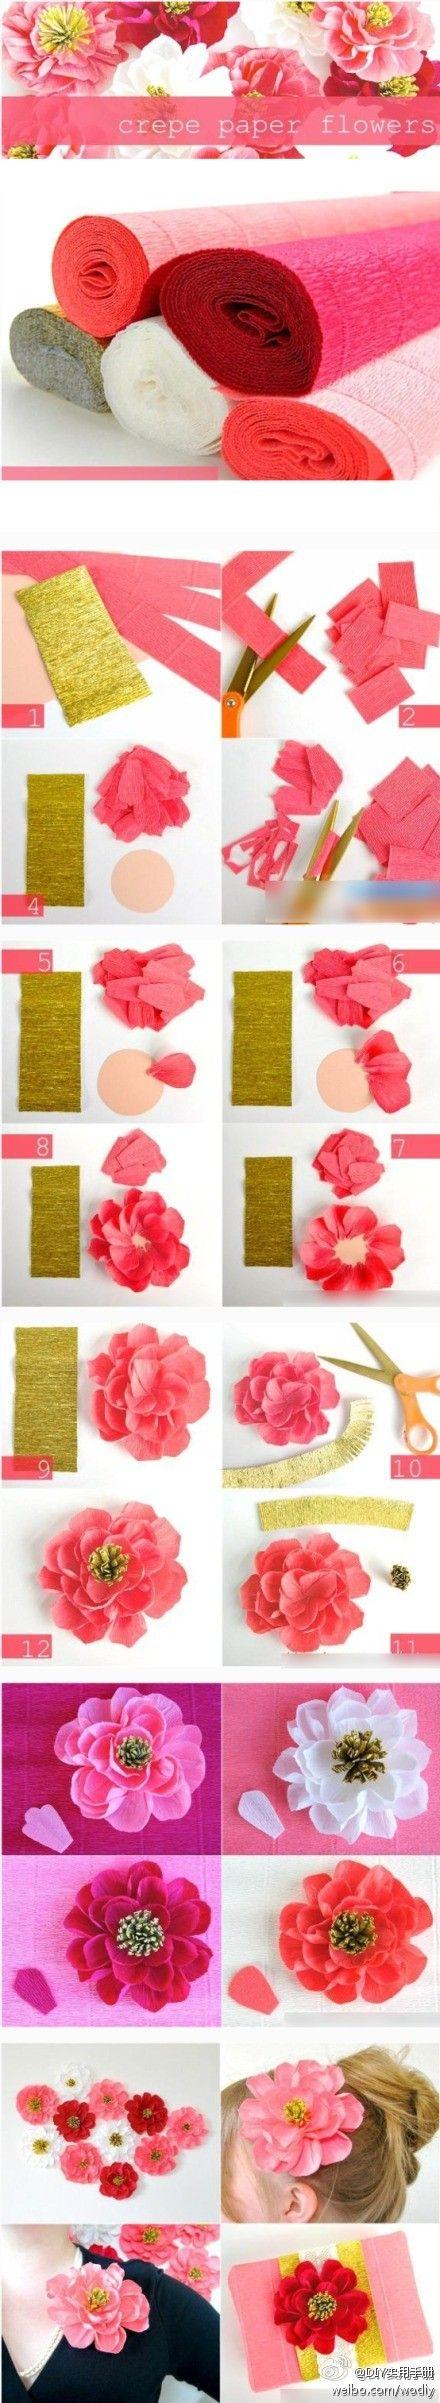 Diy Crepe Paper Flowers Diy Flowers Pinterest Crepe Paper